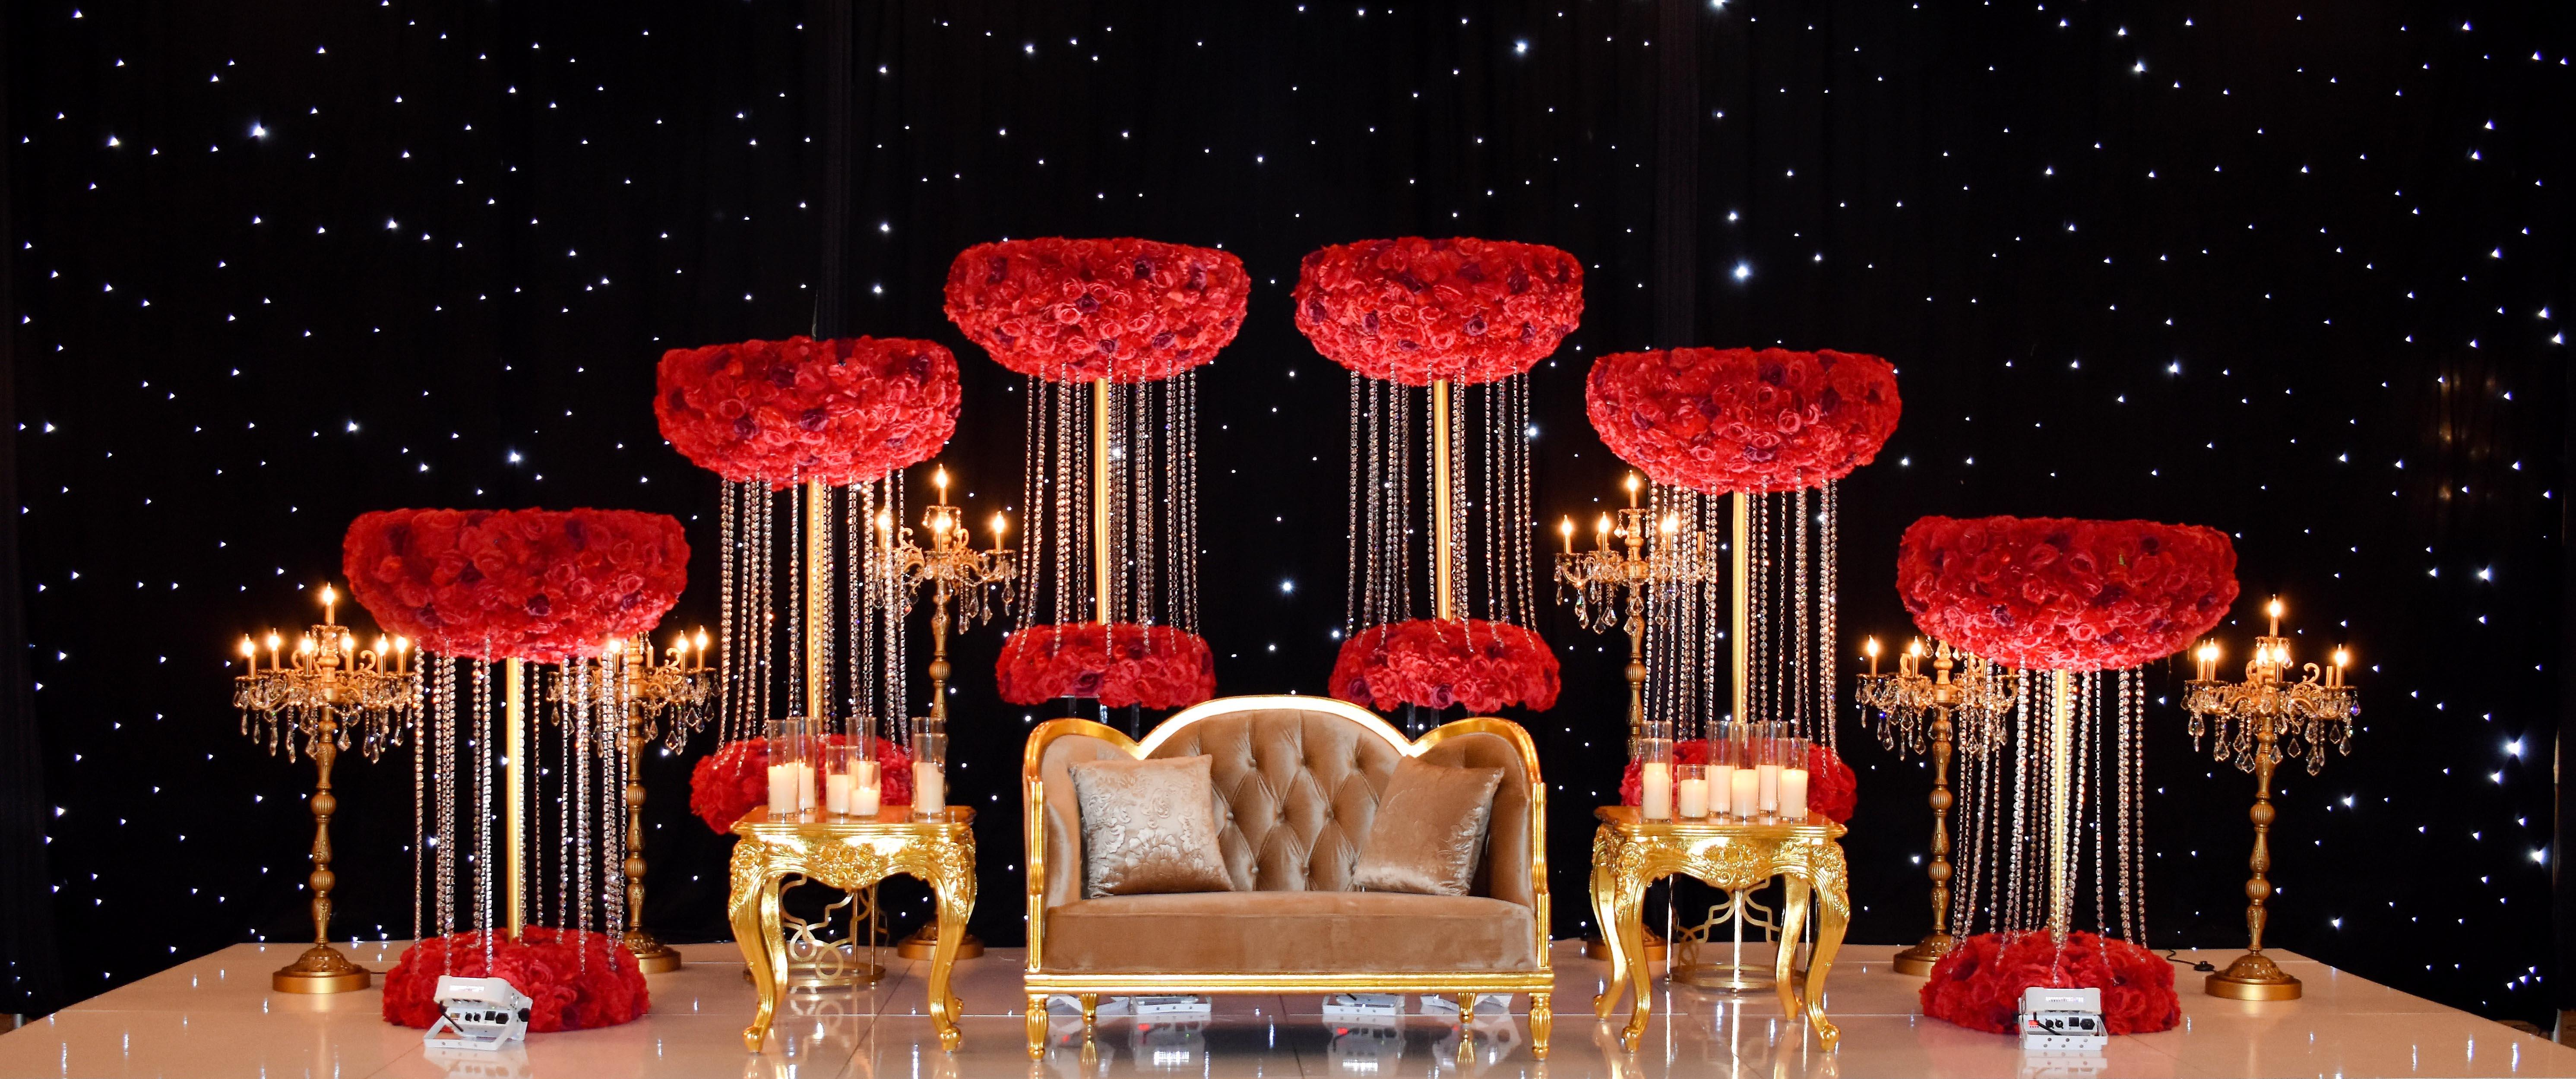 Nirali Decor Indian Wedding Decorations Mandap Design Engagement Garba Mehndi Floral Designs Nj Ny Pa Dc De Ga Fl La,Scandinavian Living Room Curtains